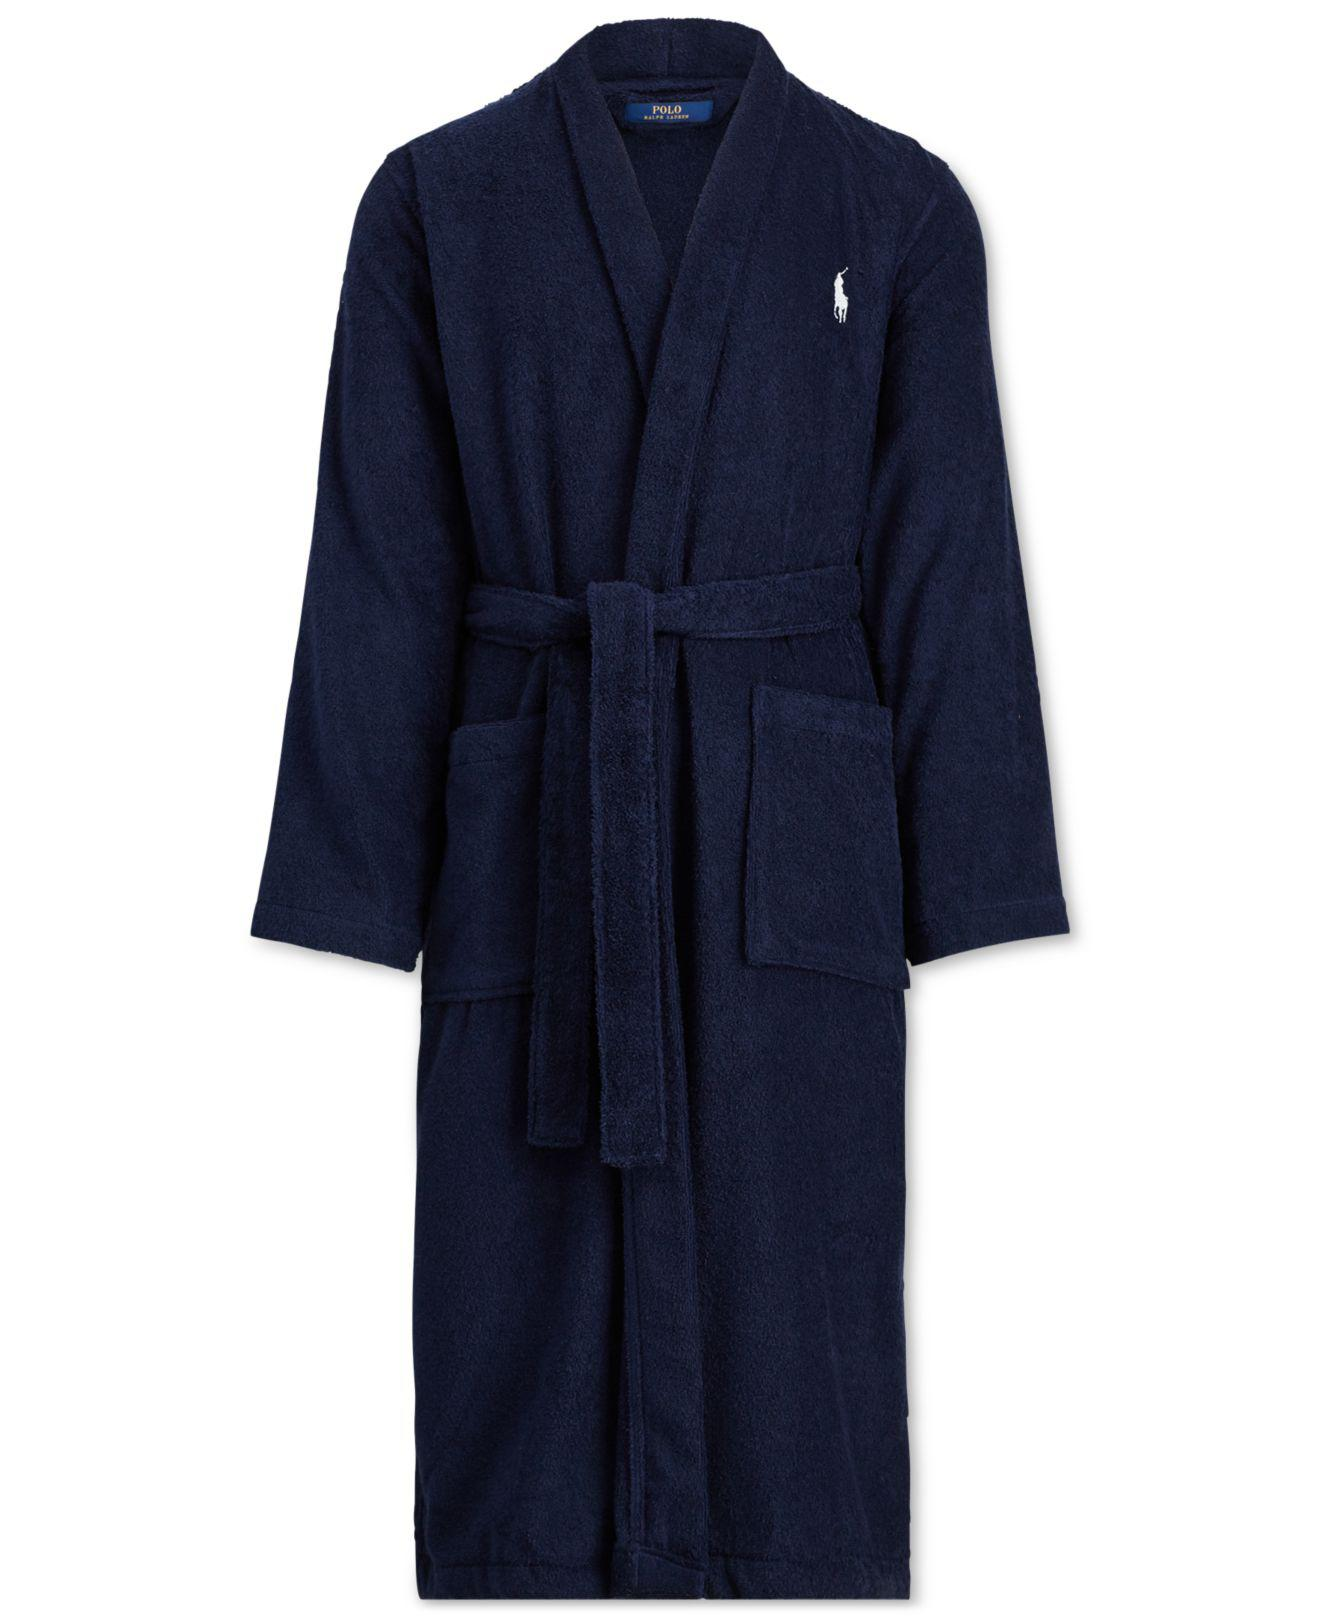 Big & Tall Shawl Cotton Robe